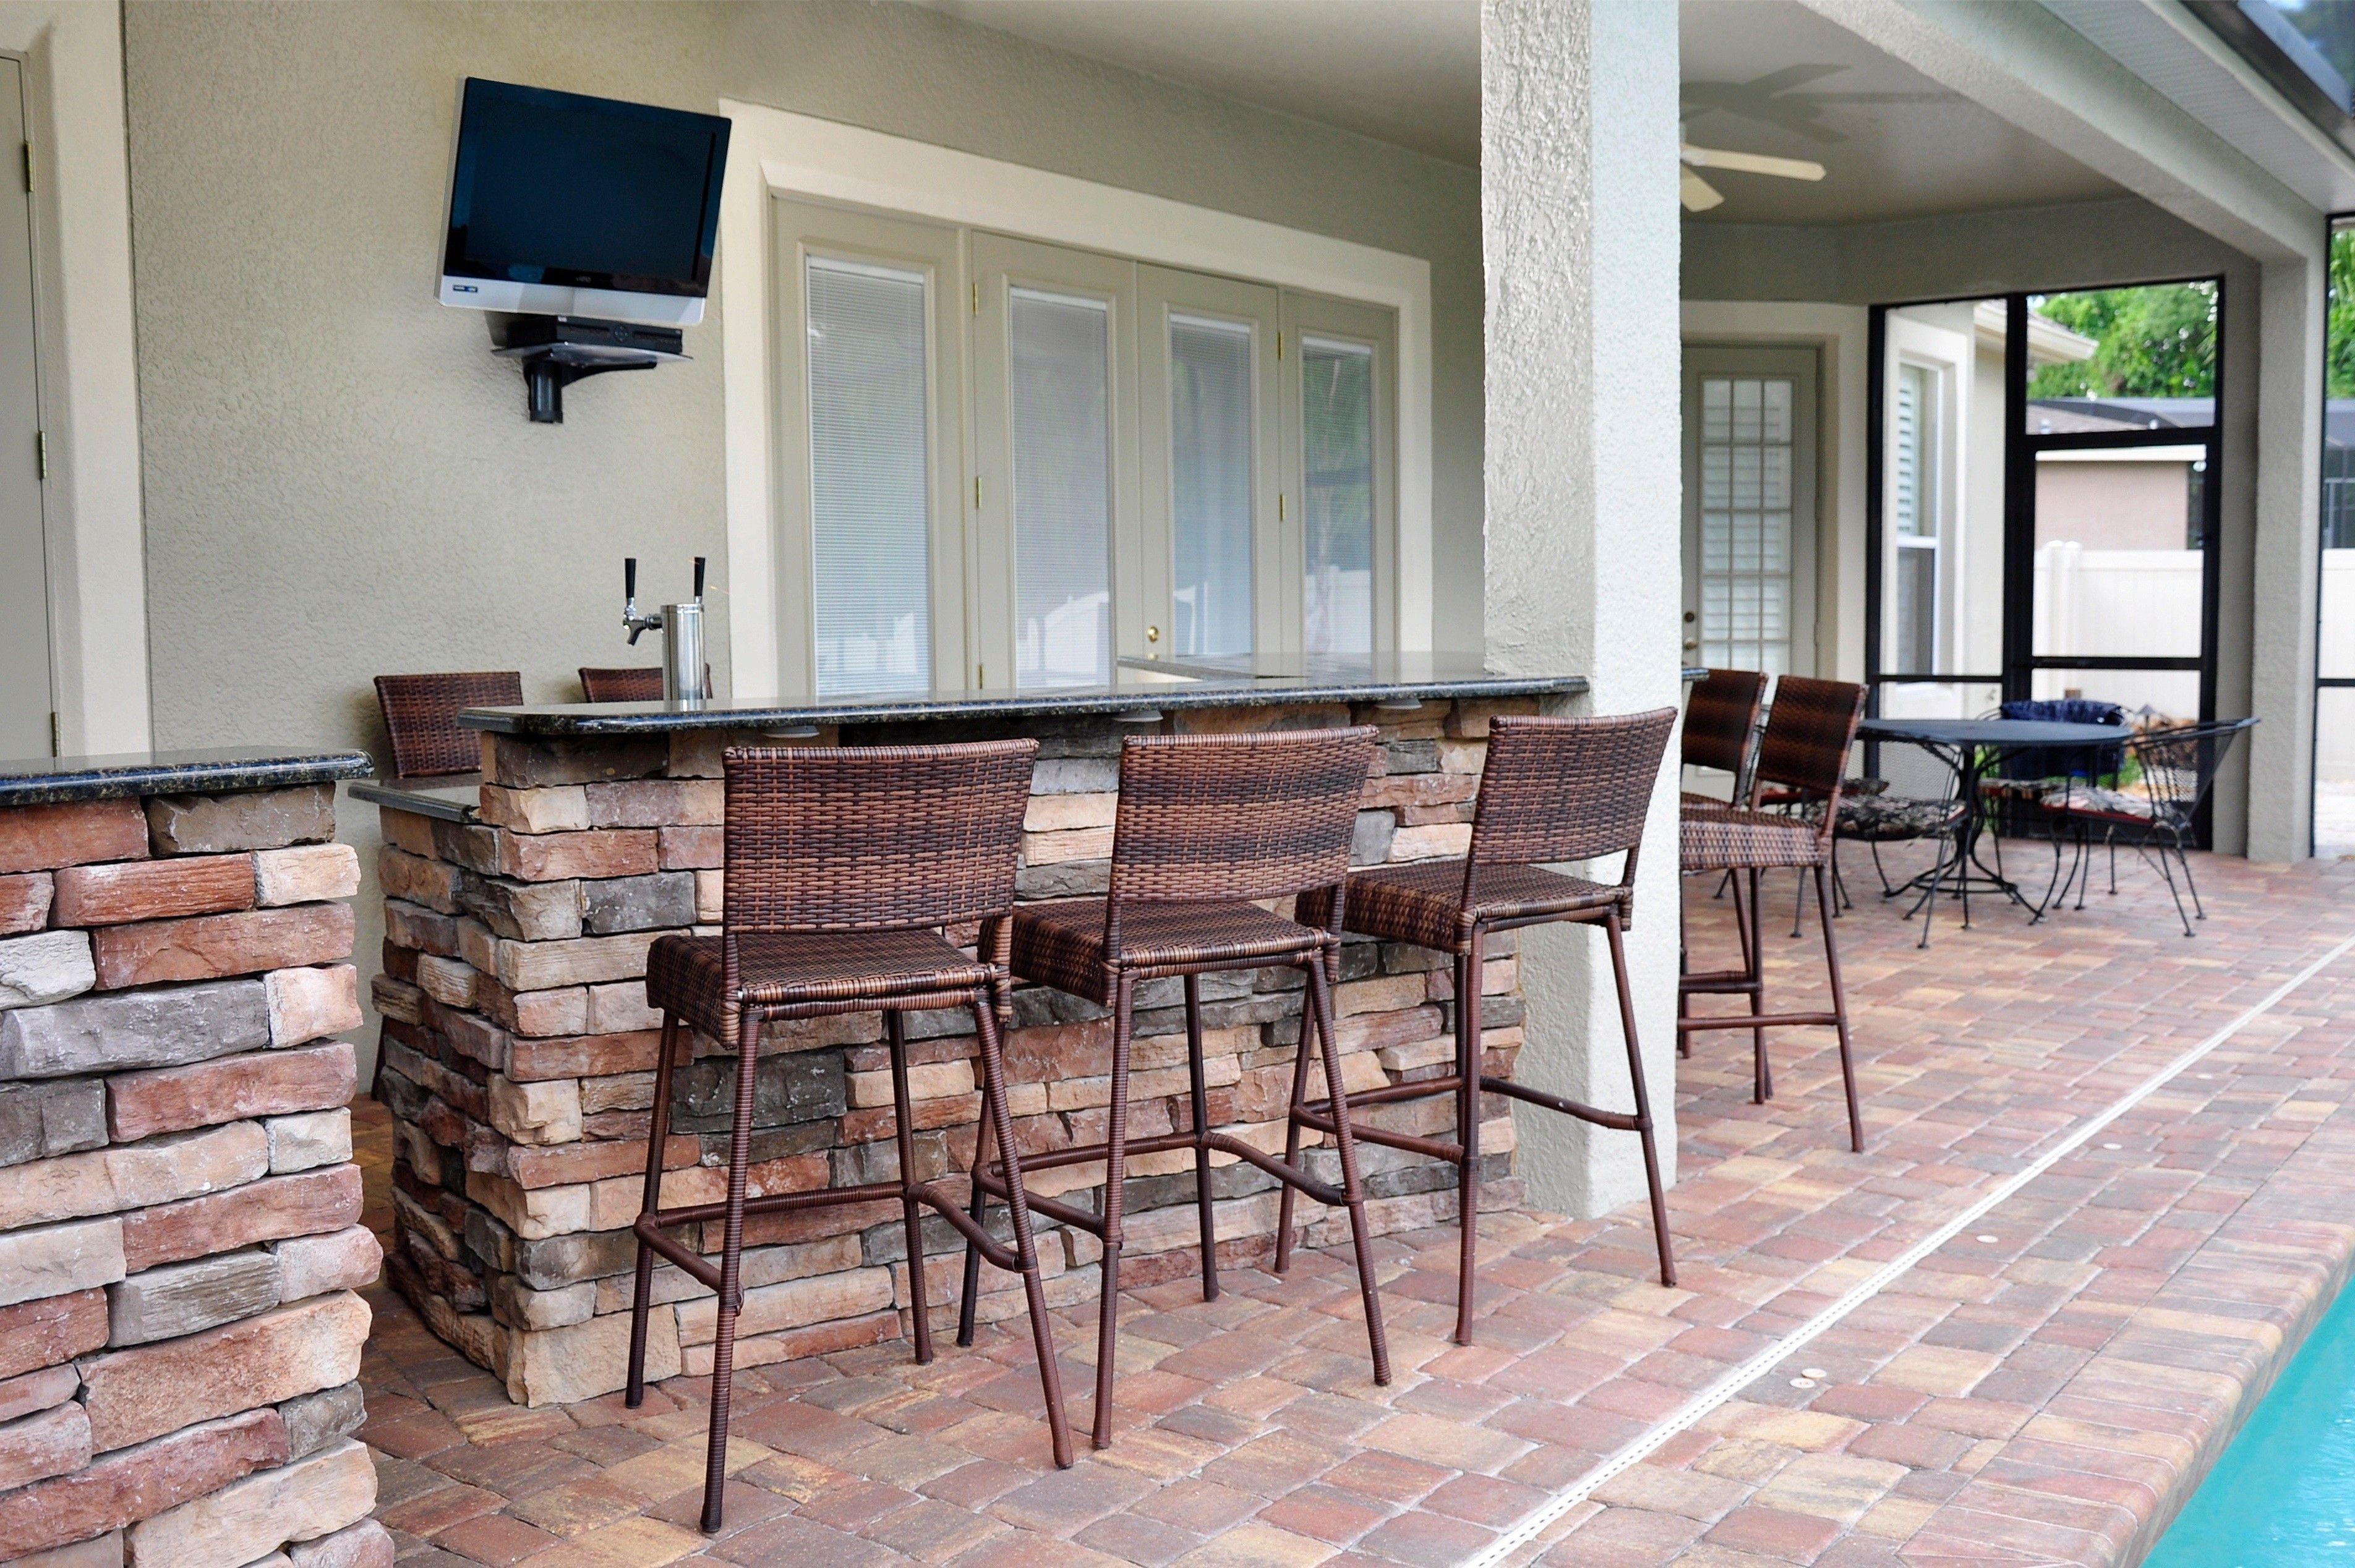 Custom Stone Patio Entertainment Area, Outdoor Kitchen, Wall Mounted TV,  Barstools.